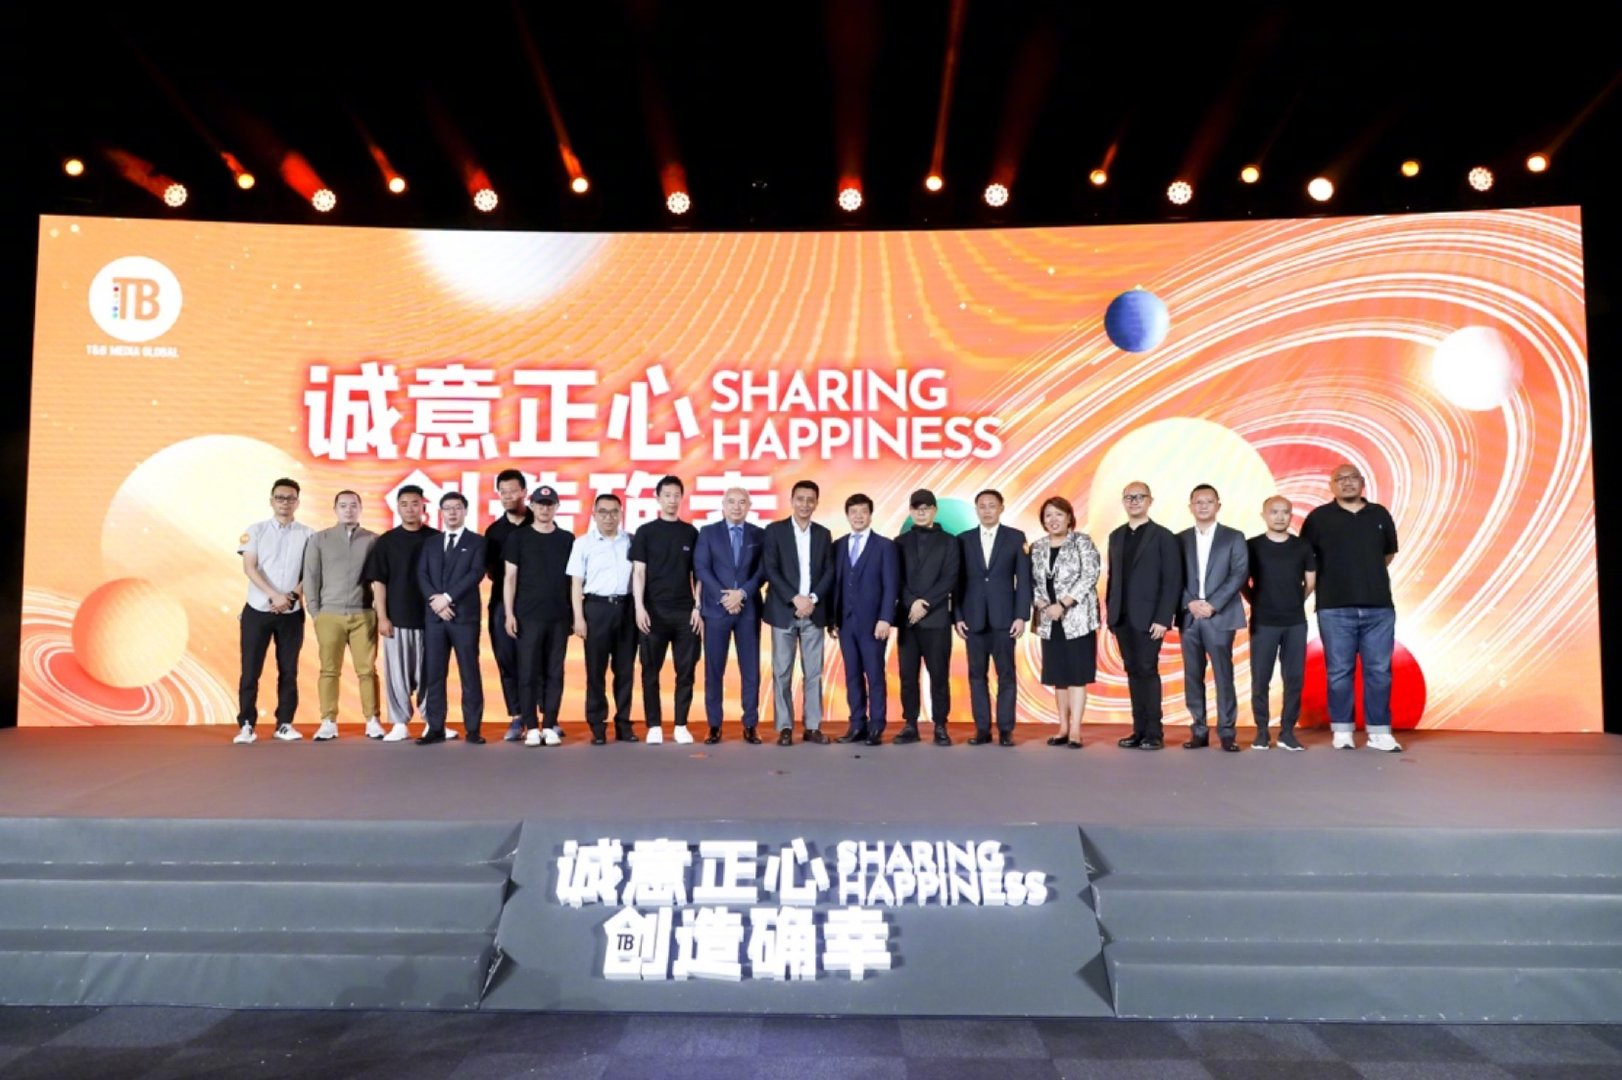 T&B环球媒体集团在上海电影节期间举办主产品发布会